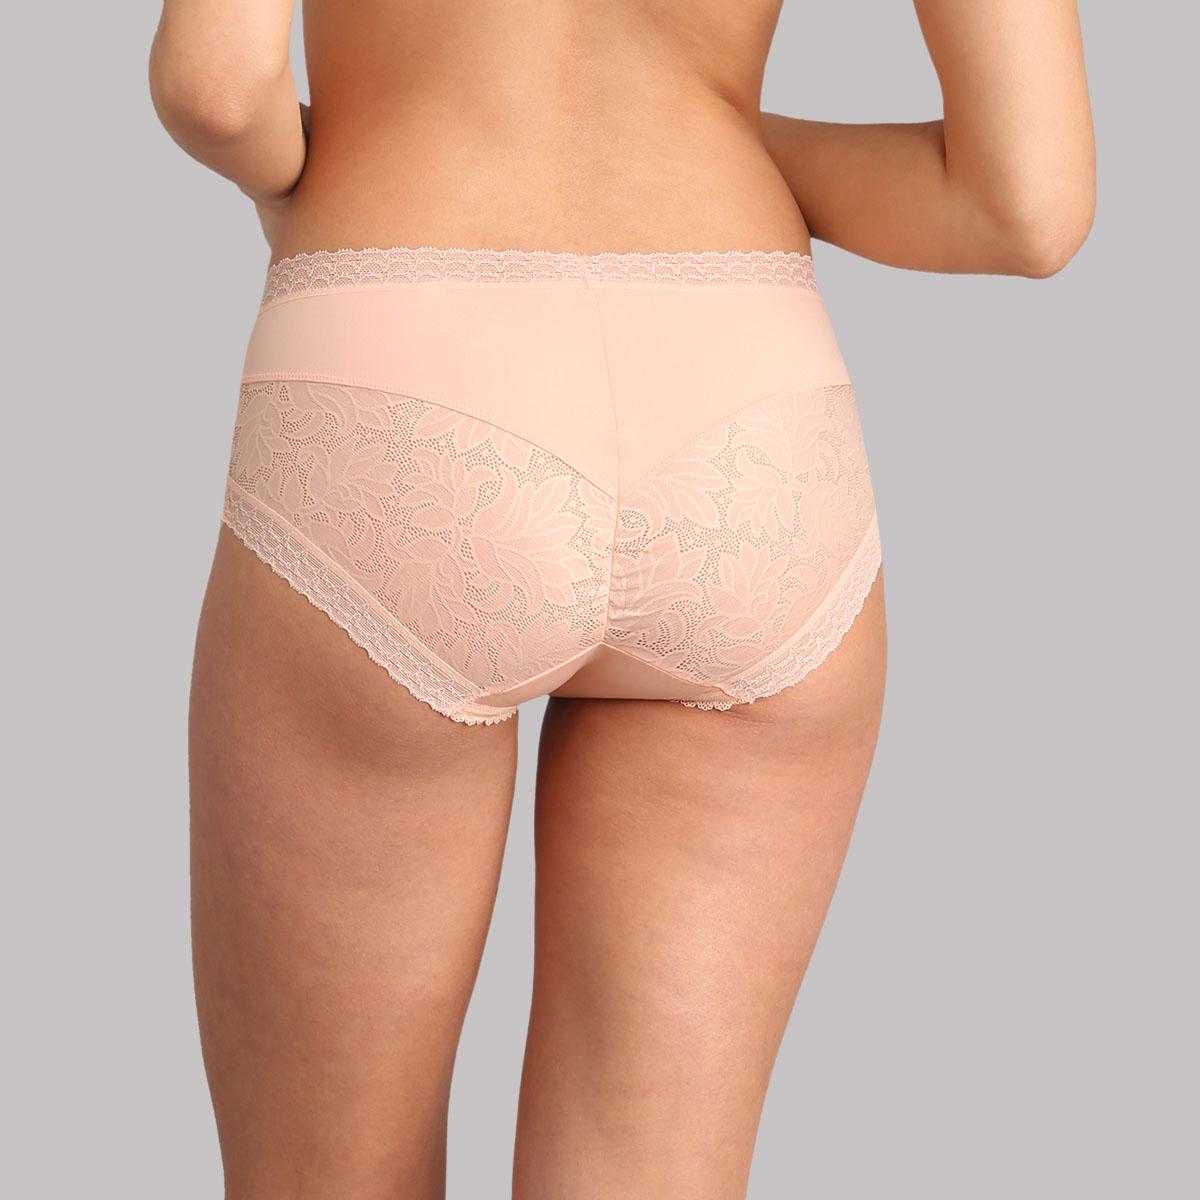 Braga invisible Midi rosa pálido Invisible Elegance, , PLAYTEX